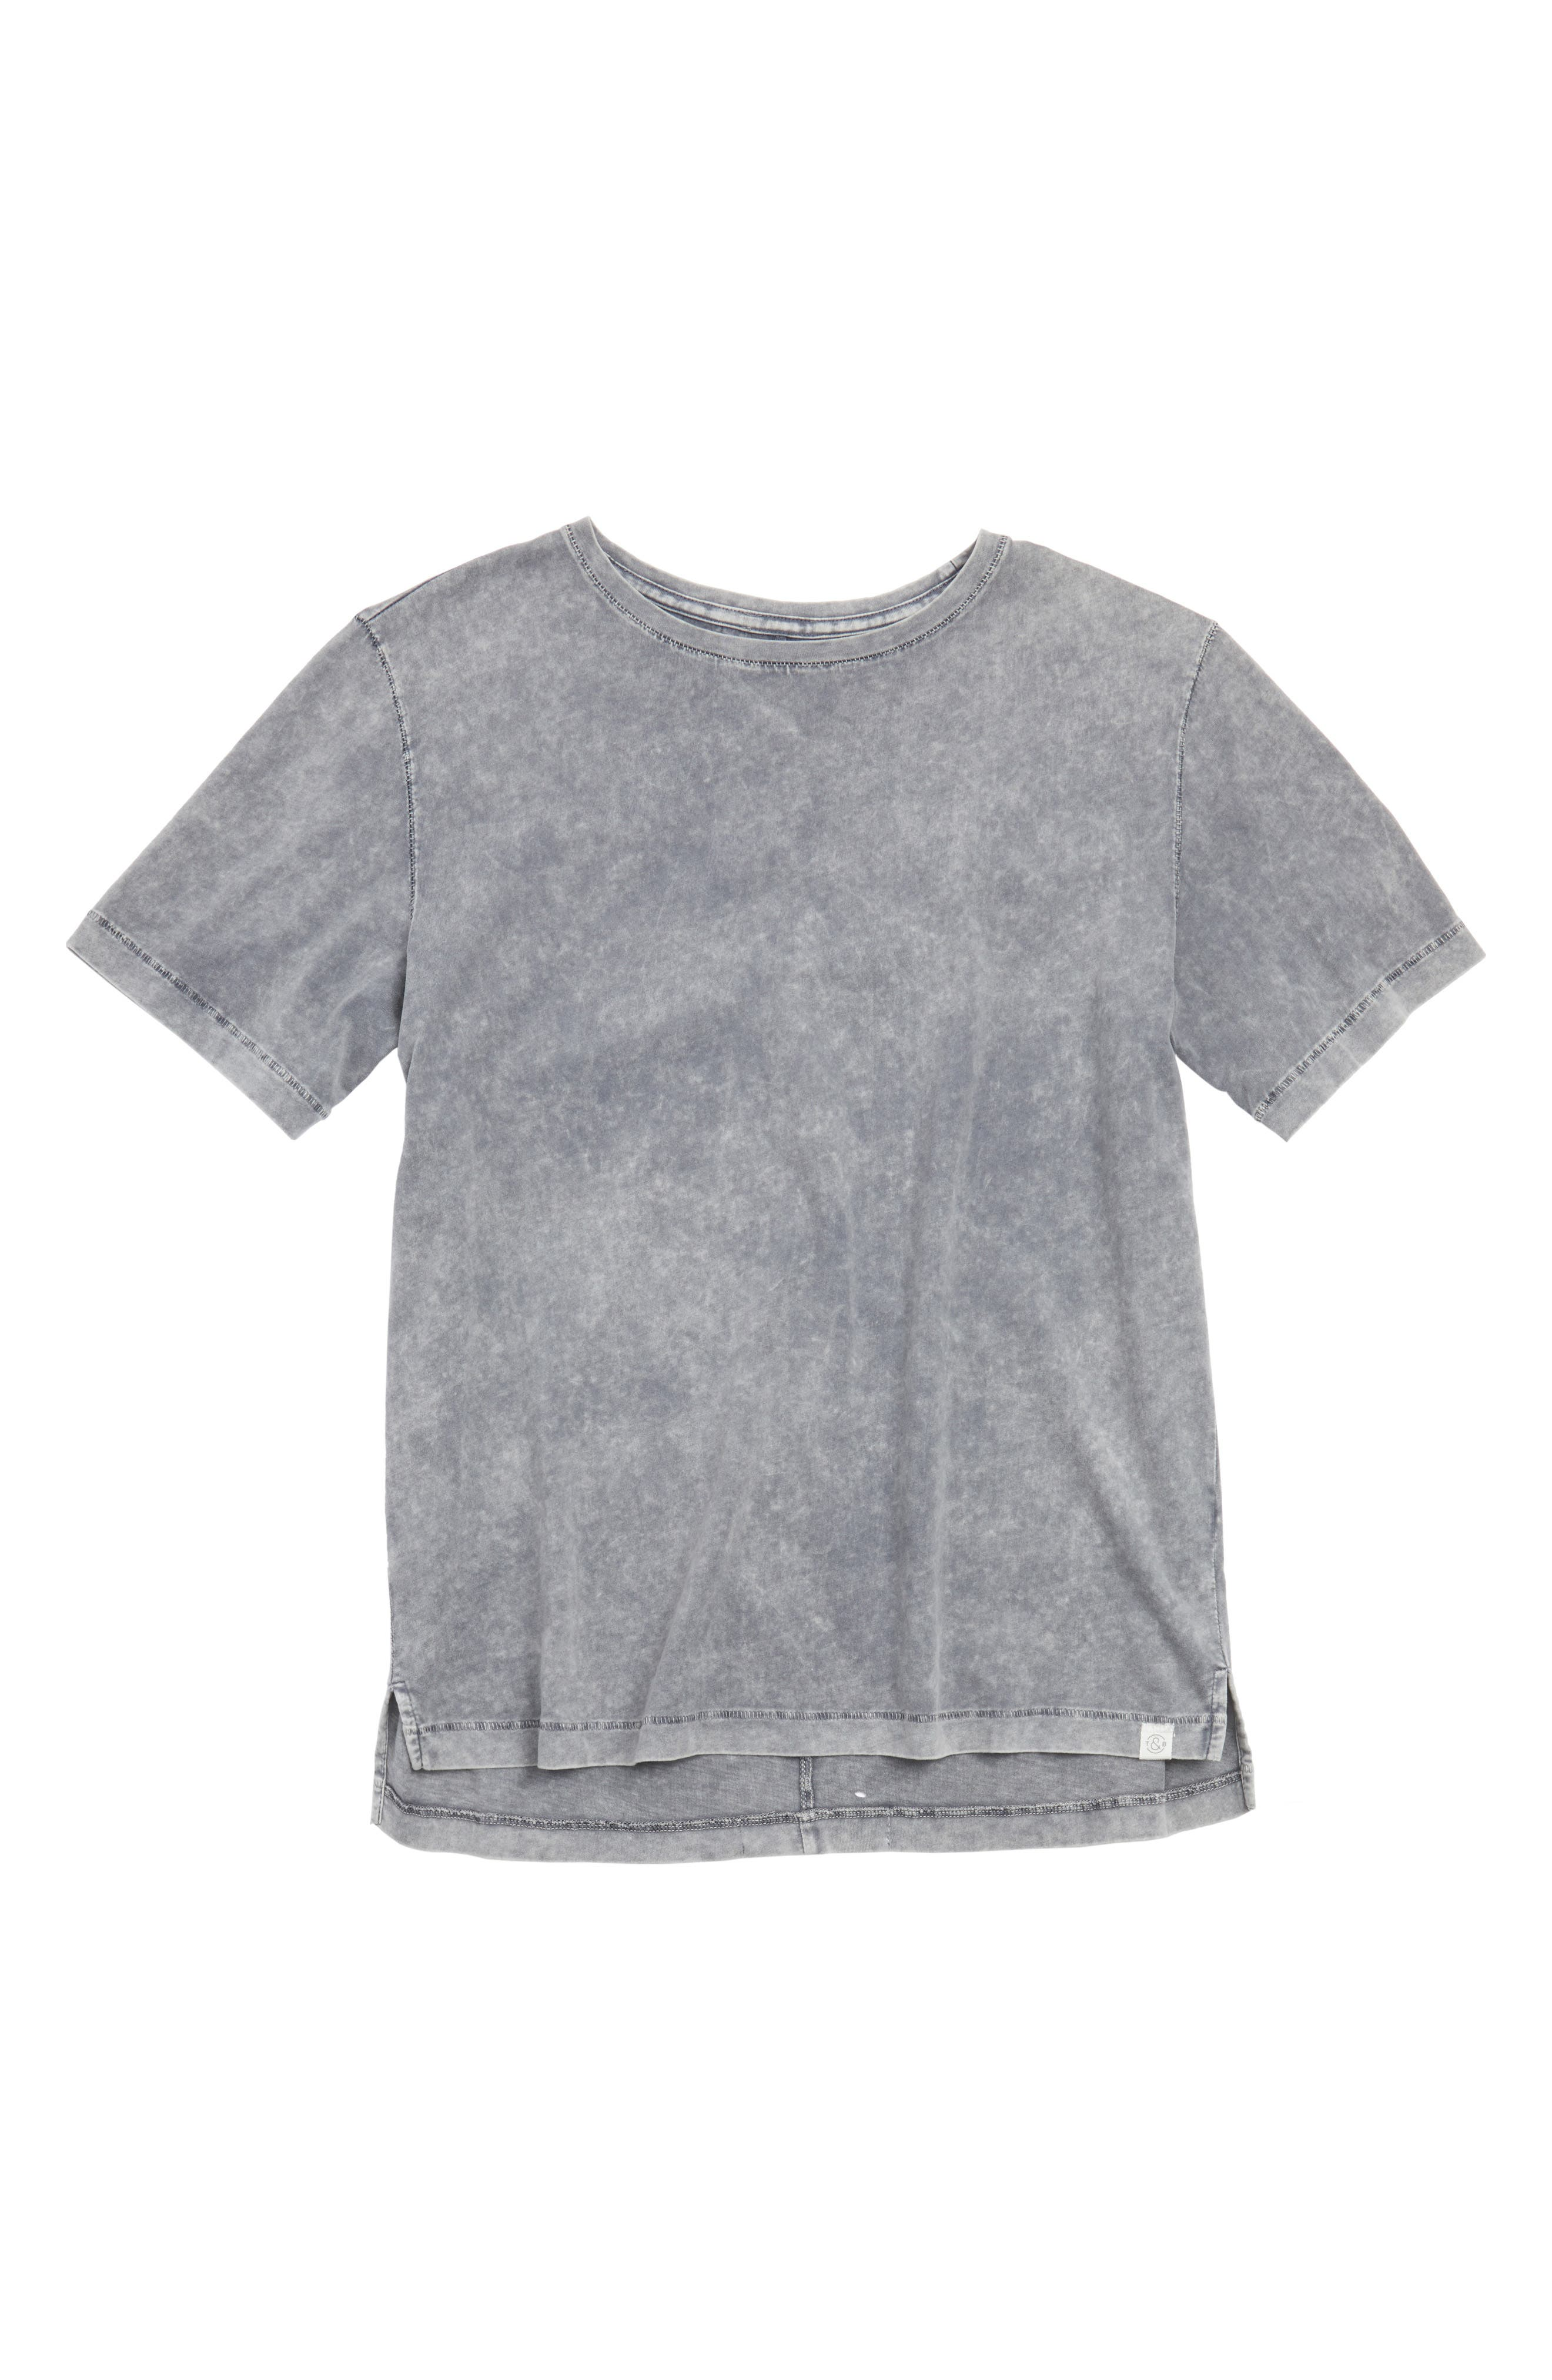 Alternate Image 1 Selected - Treasure & Bond Polo Hem Crewneck T-Shirt (Big Boy)